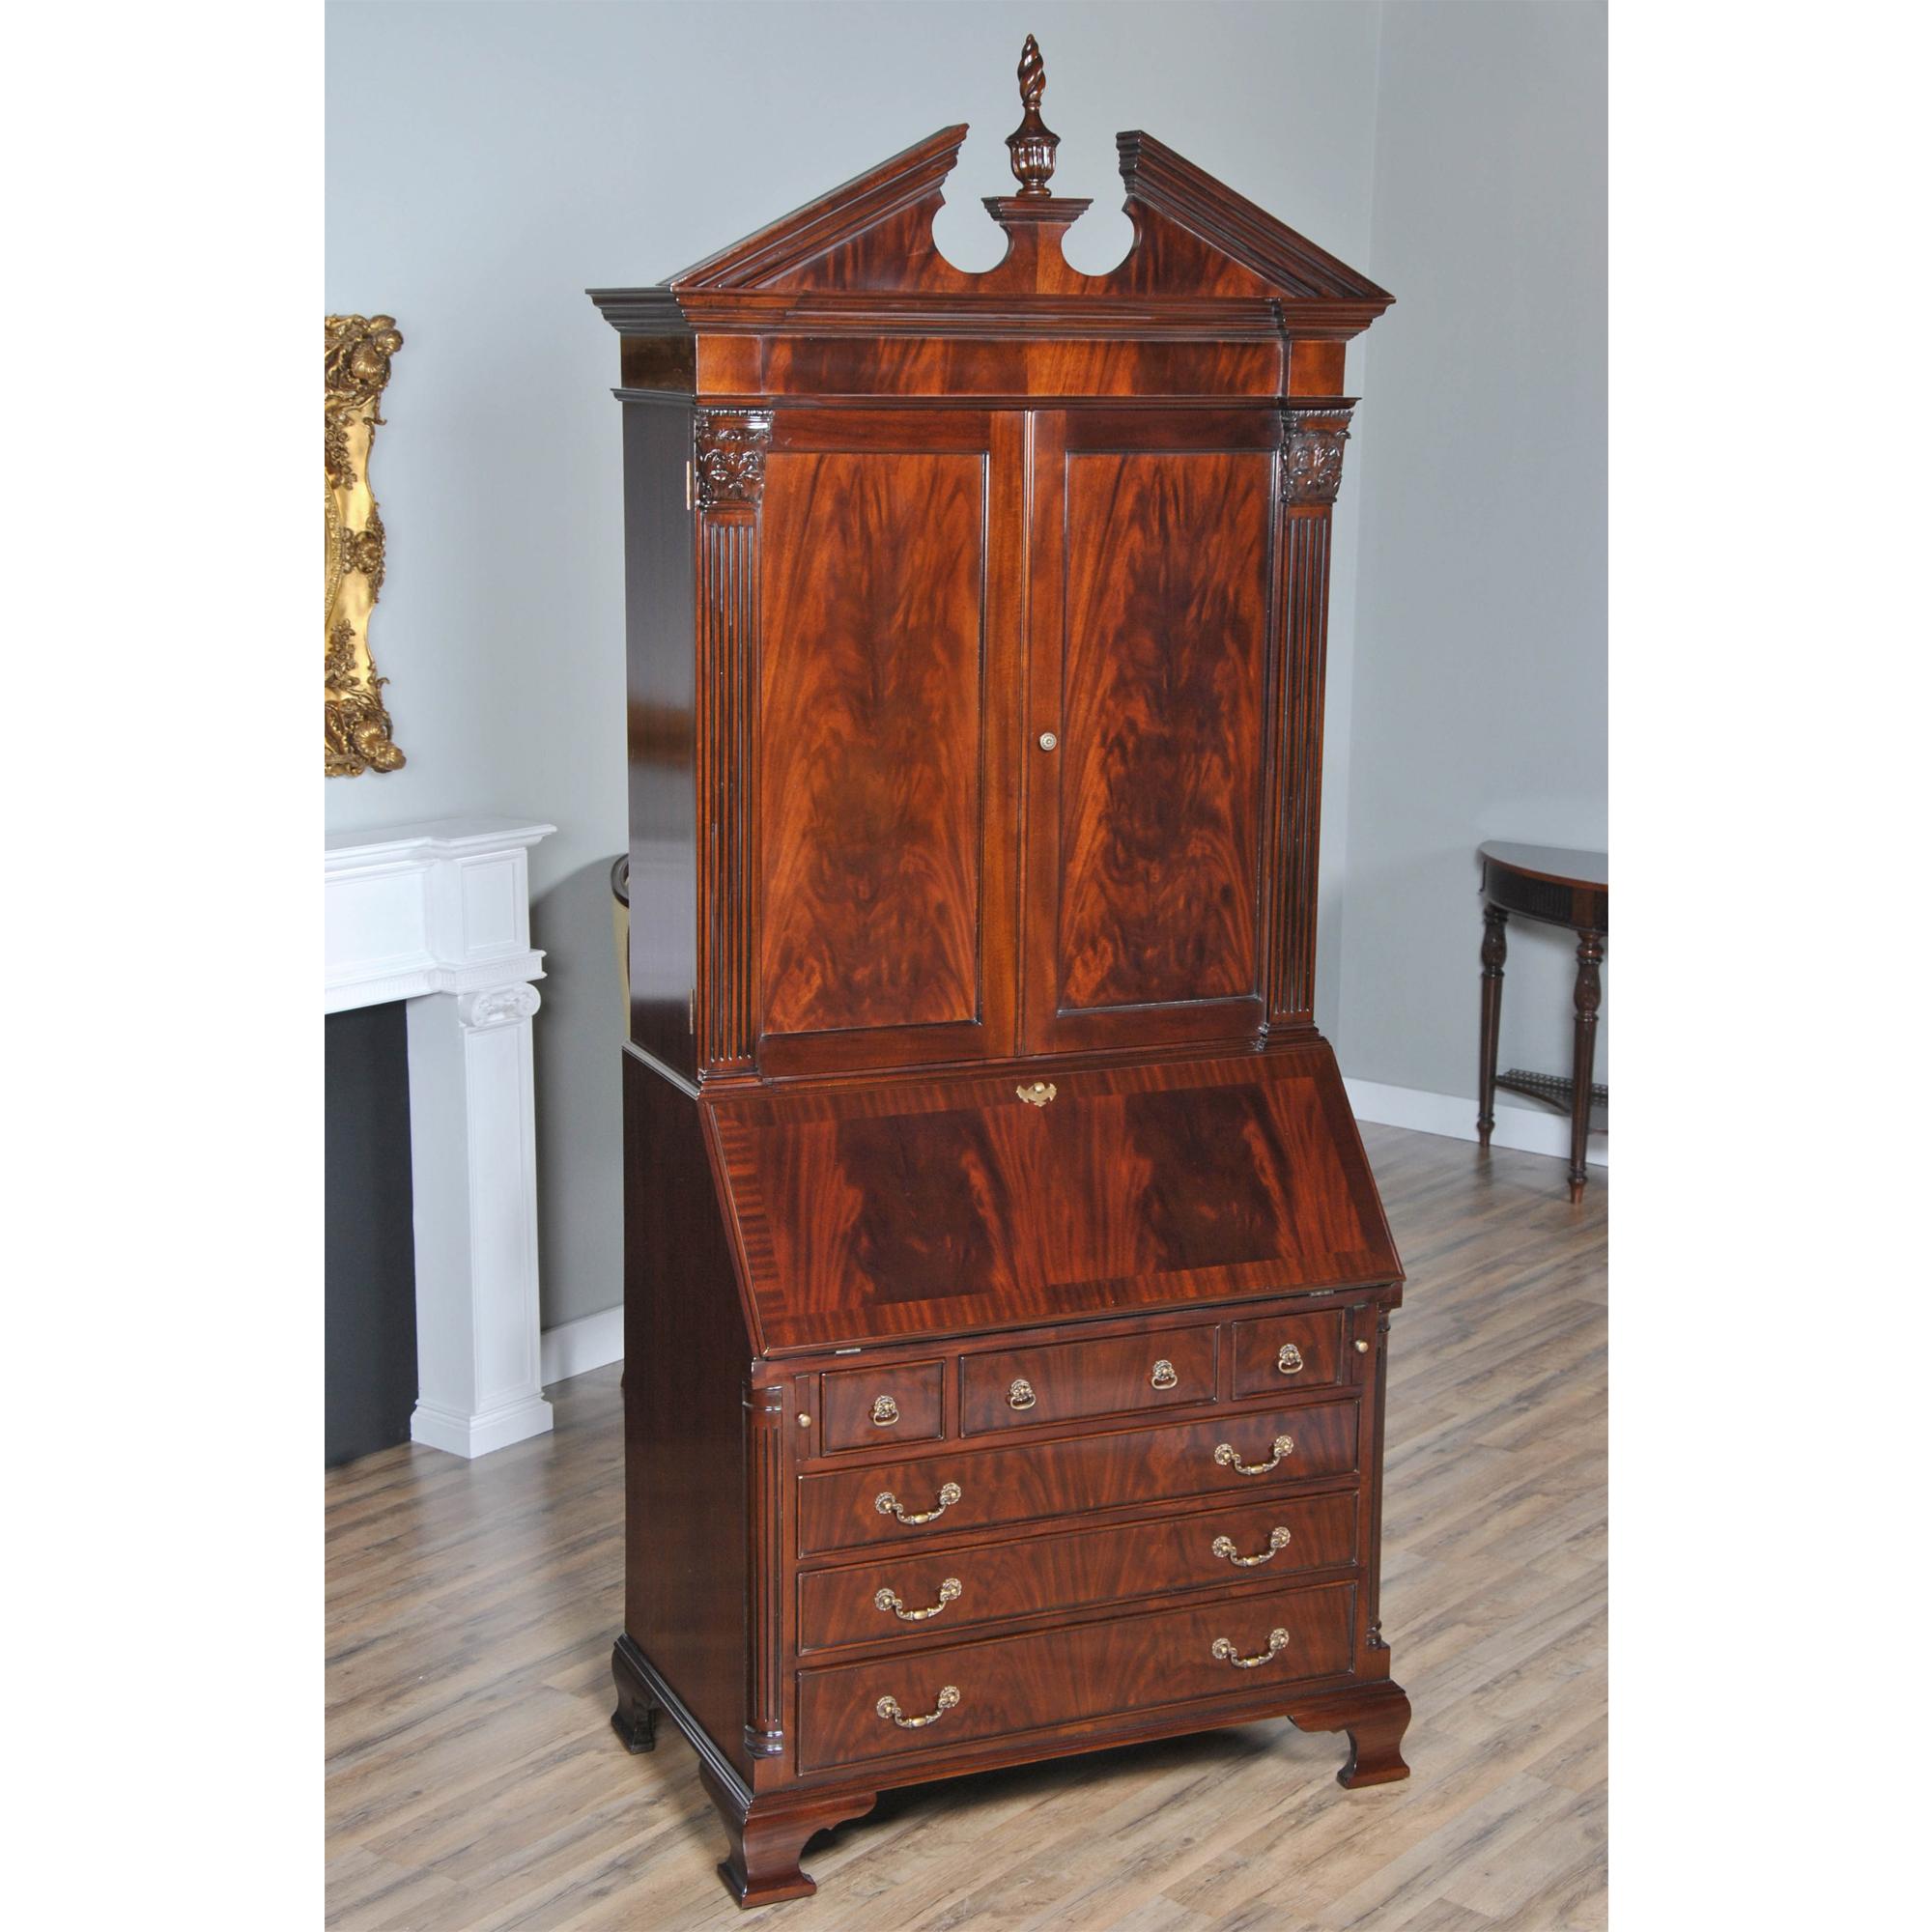 knockoutorange shopping secretaries the most secretary open stylish furniture easton best desks desk creme modern